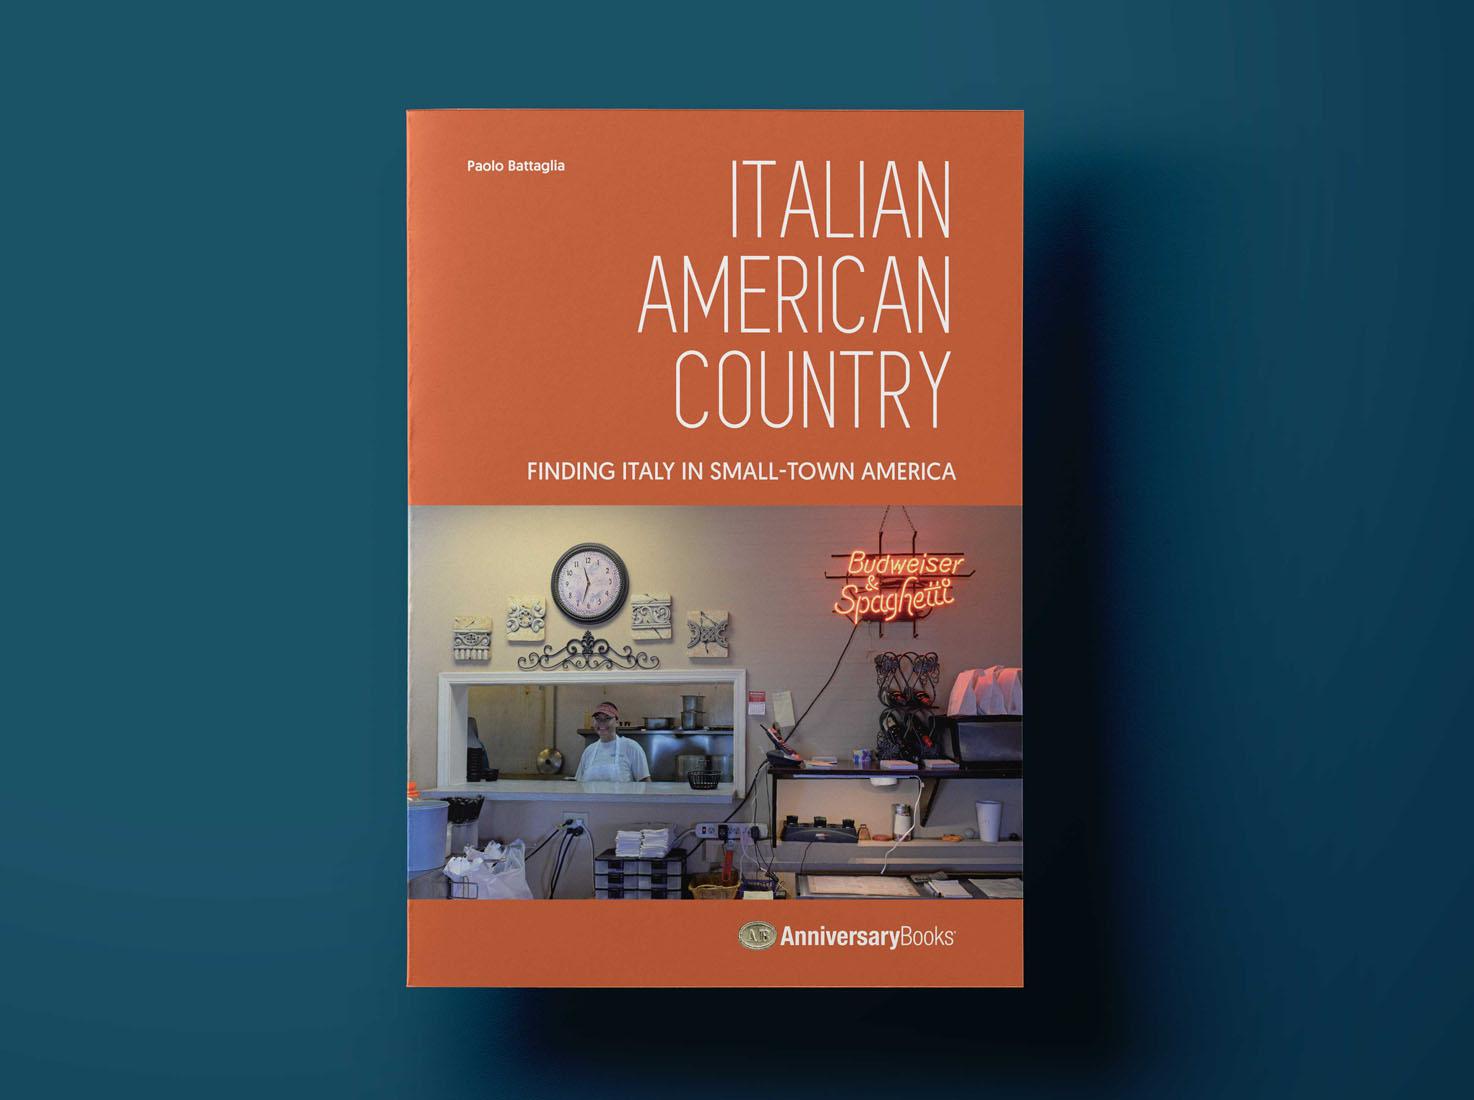 Italian American Country English Version